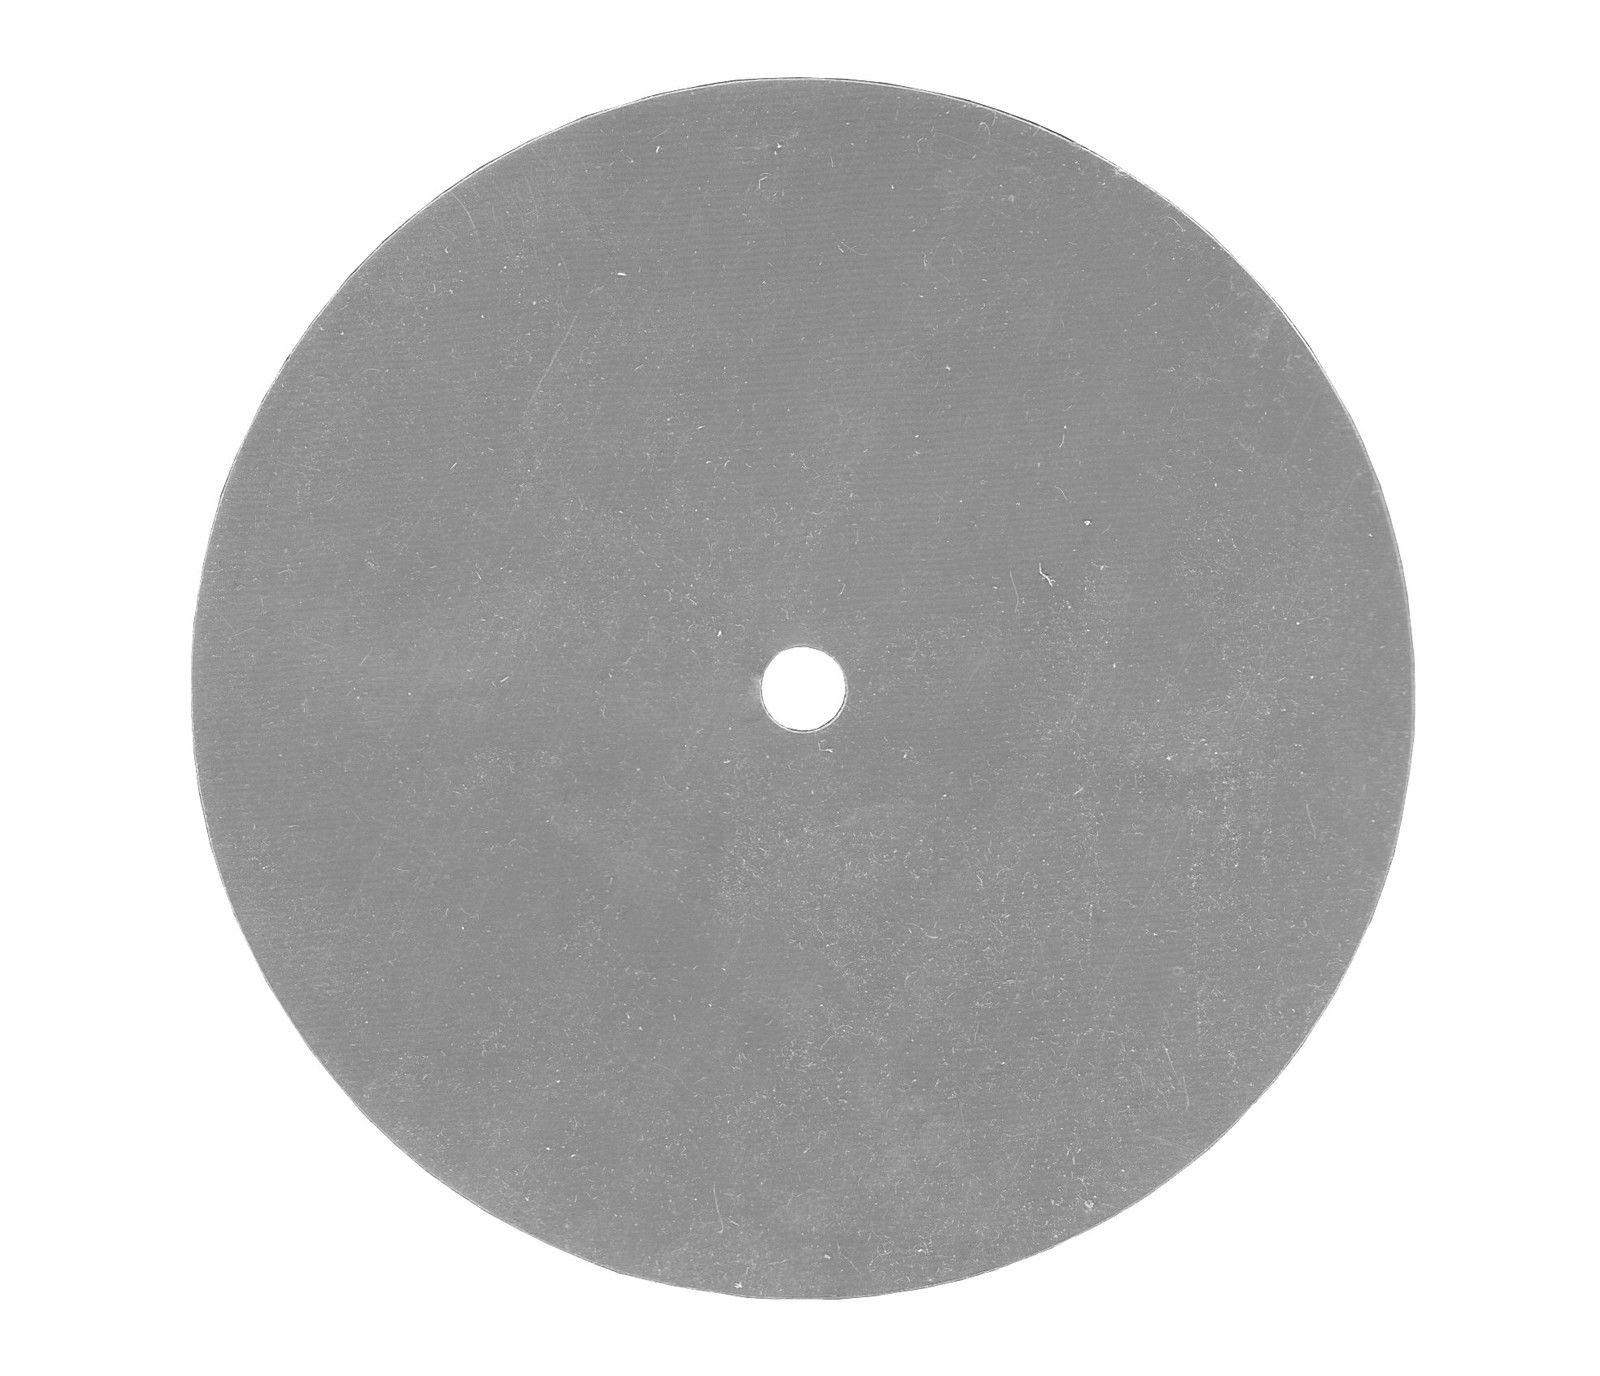 "POLY SYPHON DIAPHRAGM 4 1/2"" DIAMETER - DIA005"